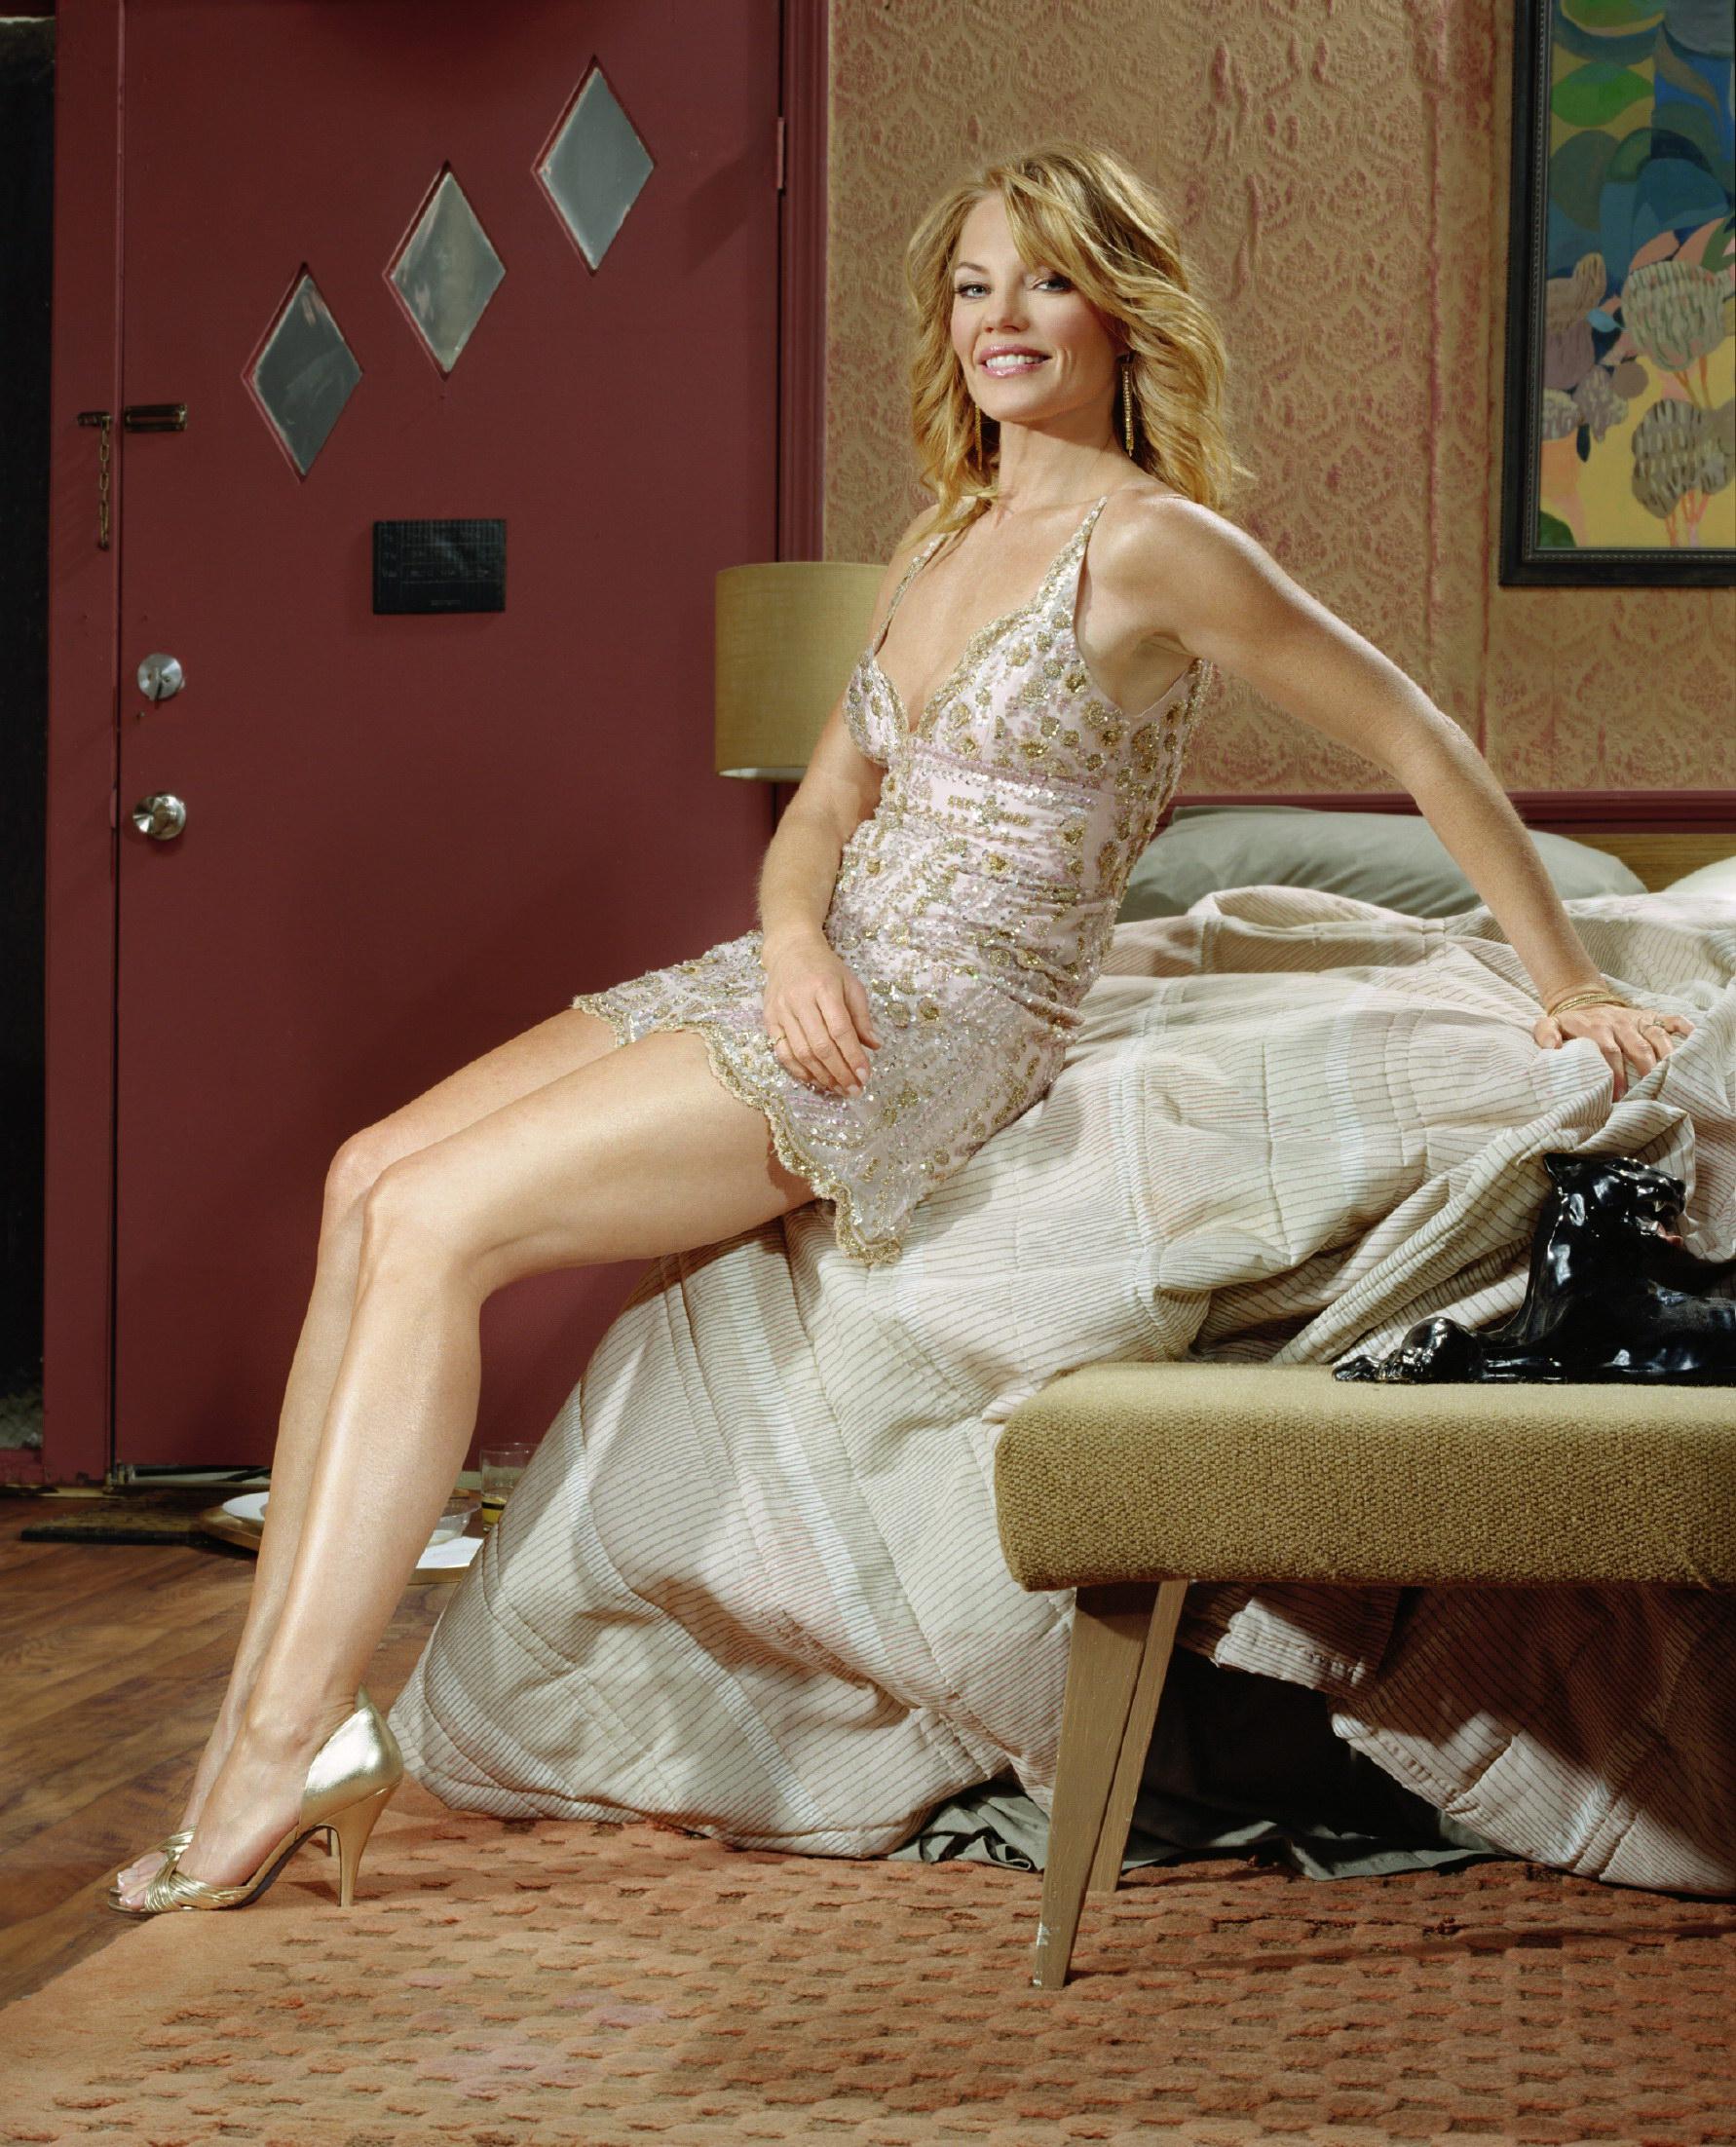 Jill Greenberg Photoshoot 2005 for TV Guide